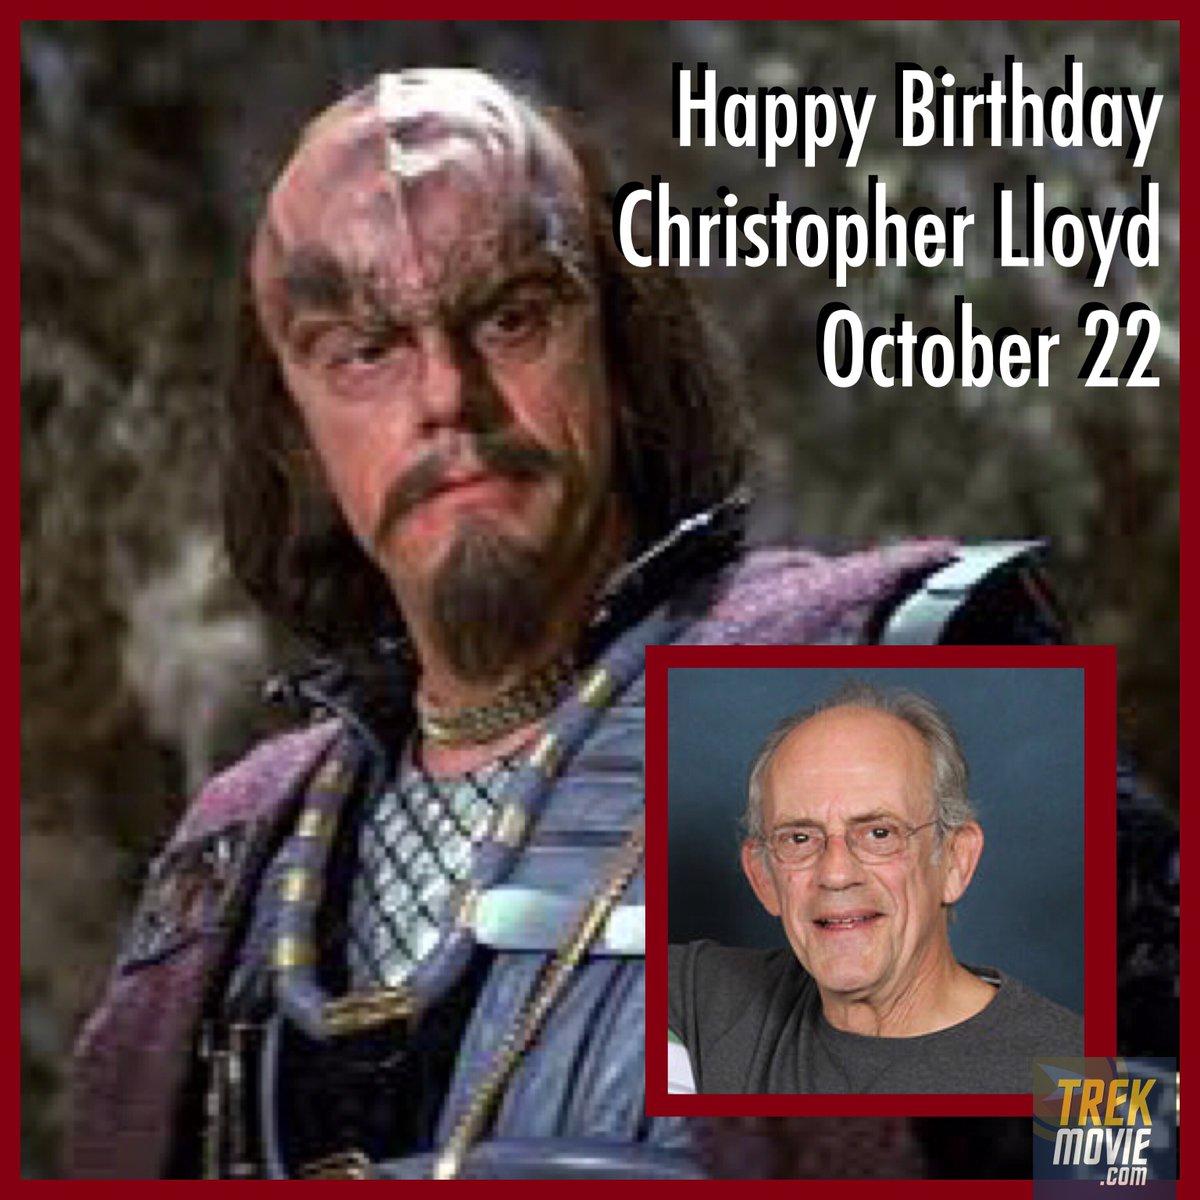 Trekmovie Com בטוויטר Happy 80th Birthday To Docbrownlloyd Aka Klingon Commander Kruge Who Had Kirk S Son Murdered In Star Trek Iii The Search For Spock Startrek Taxi Reverendjim Backtothefuture Christopherlloyd Https T Co Eyghhsdcqz